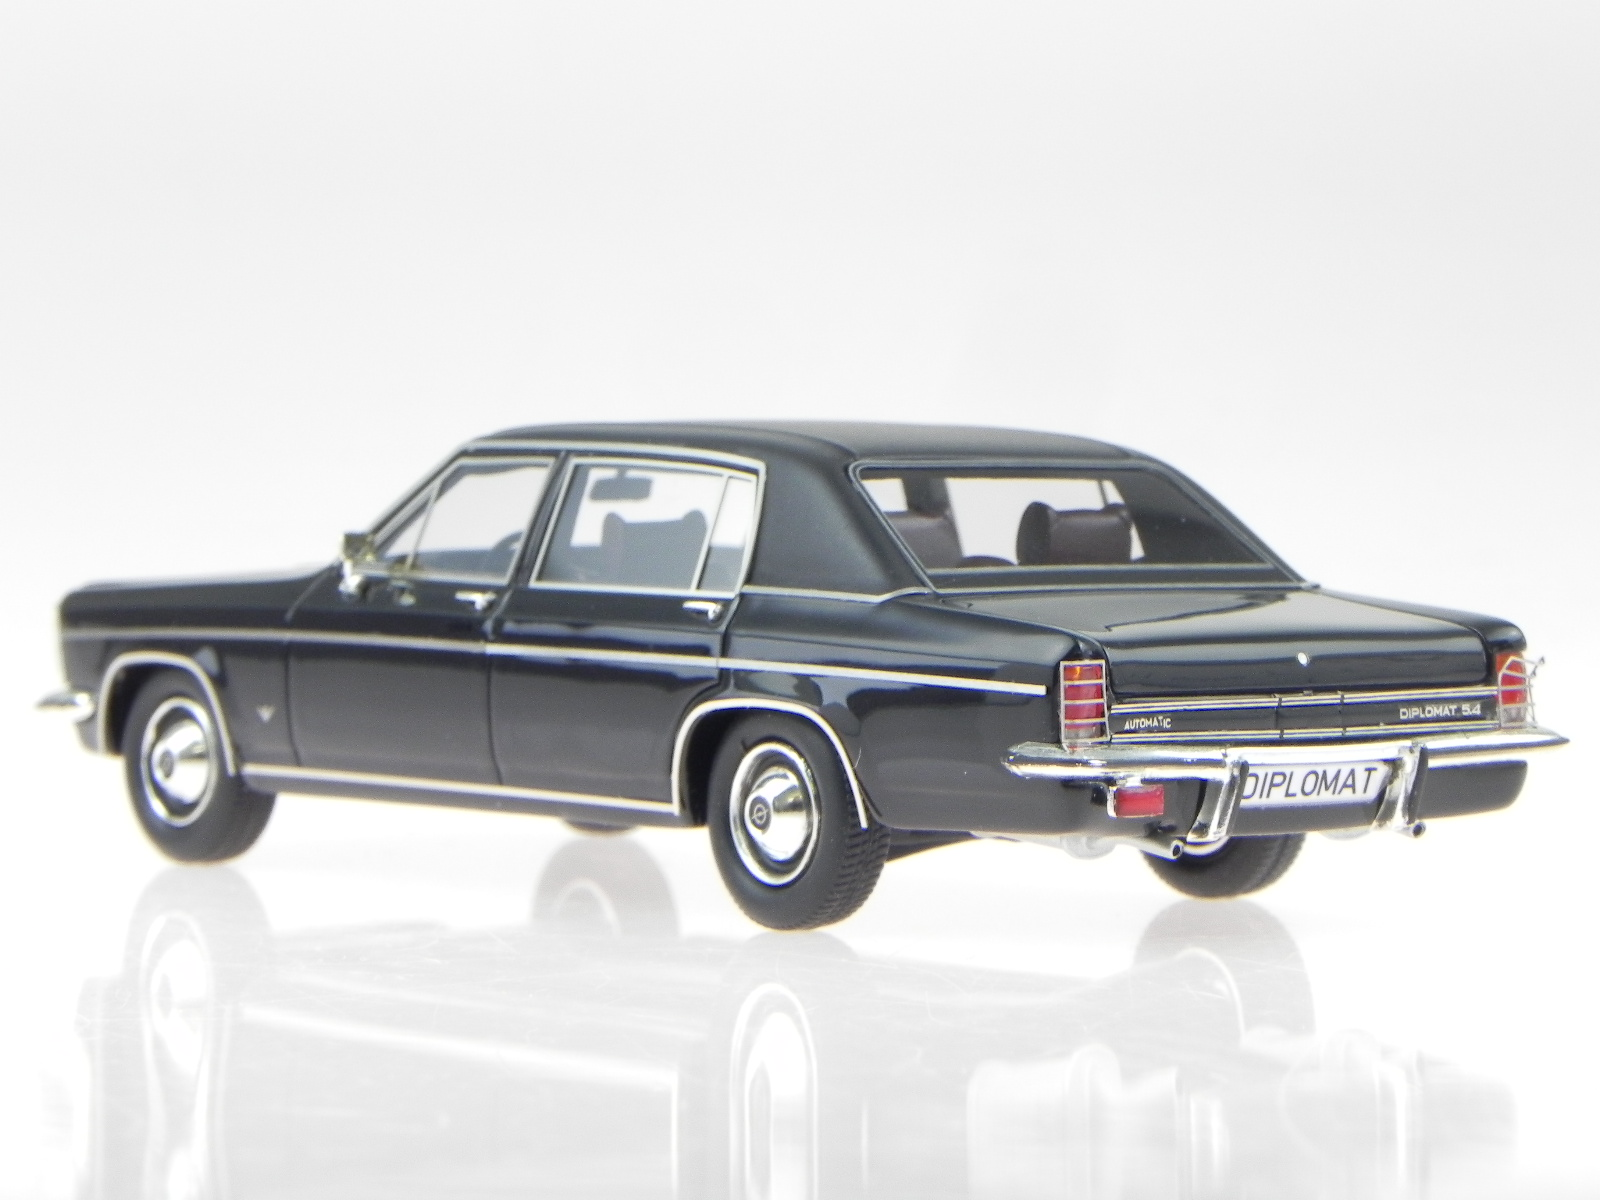 Opel Diplomat B lungo Vogt 1974 1974 1974 nero modellino 11502-061 Matrix 1:43 7aa83c